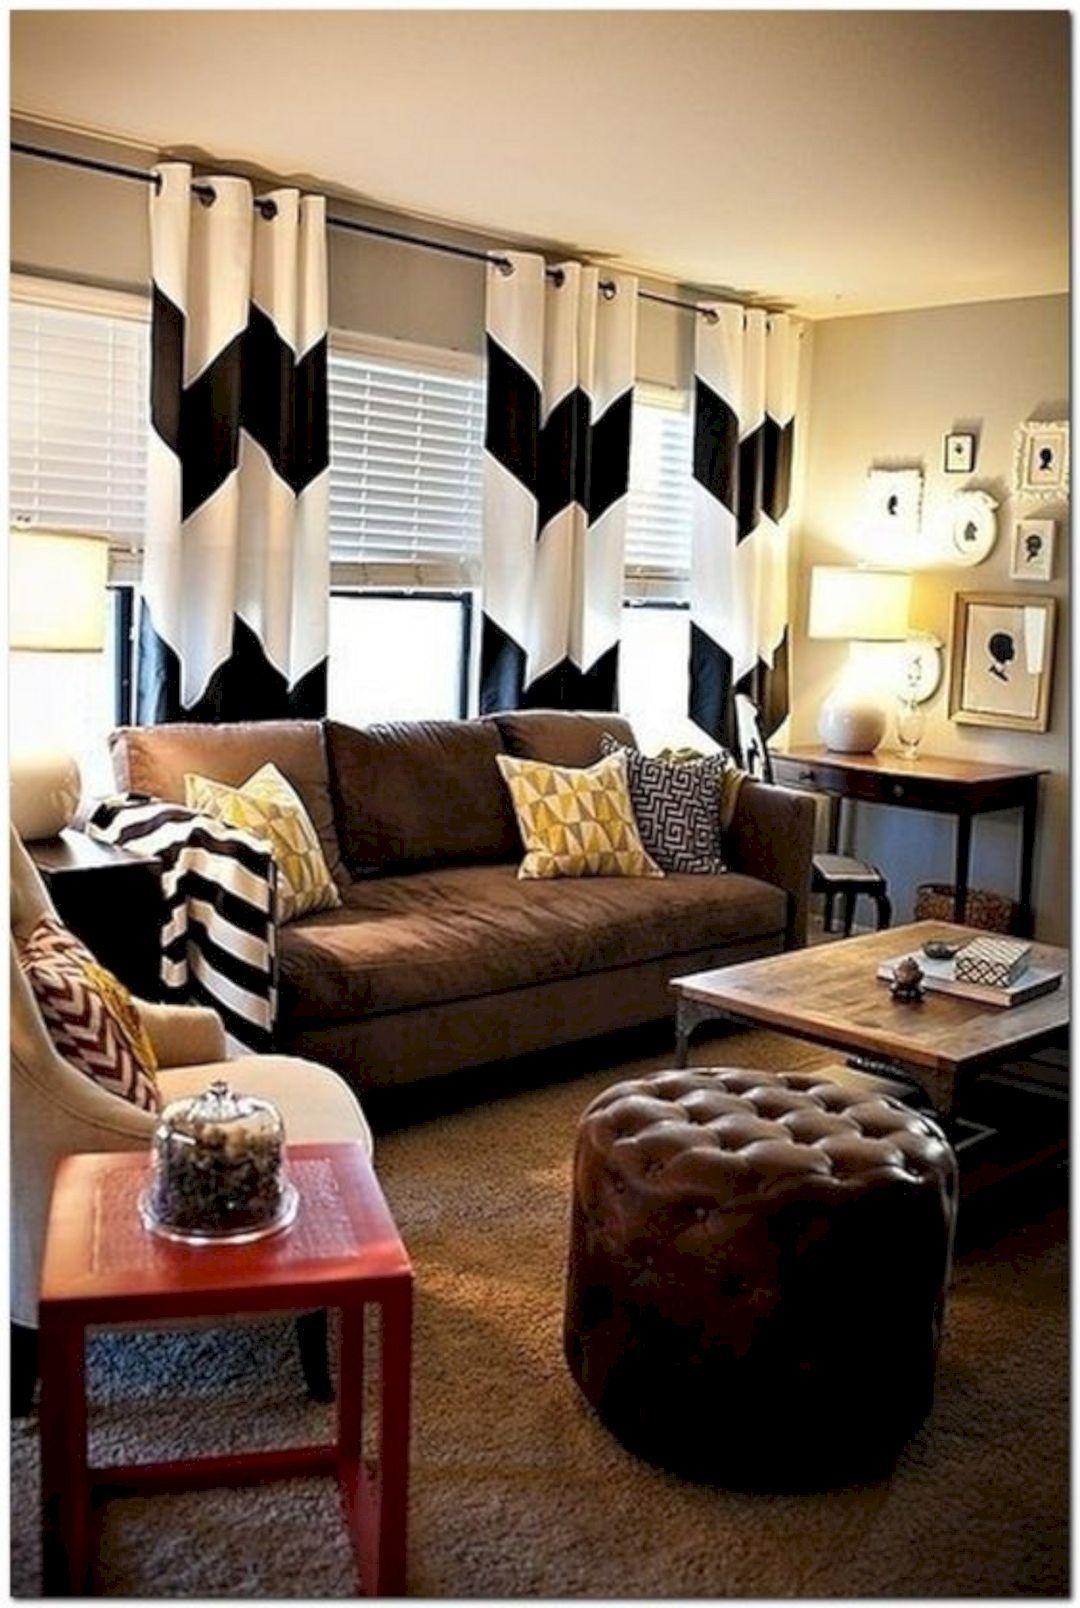 5 Coolest Apartment Furniture Ideas Brown Living Room Diy Apartment Decor Apartment Decor Black and brown living room ideas